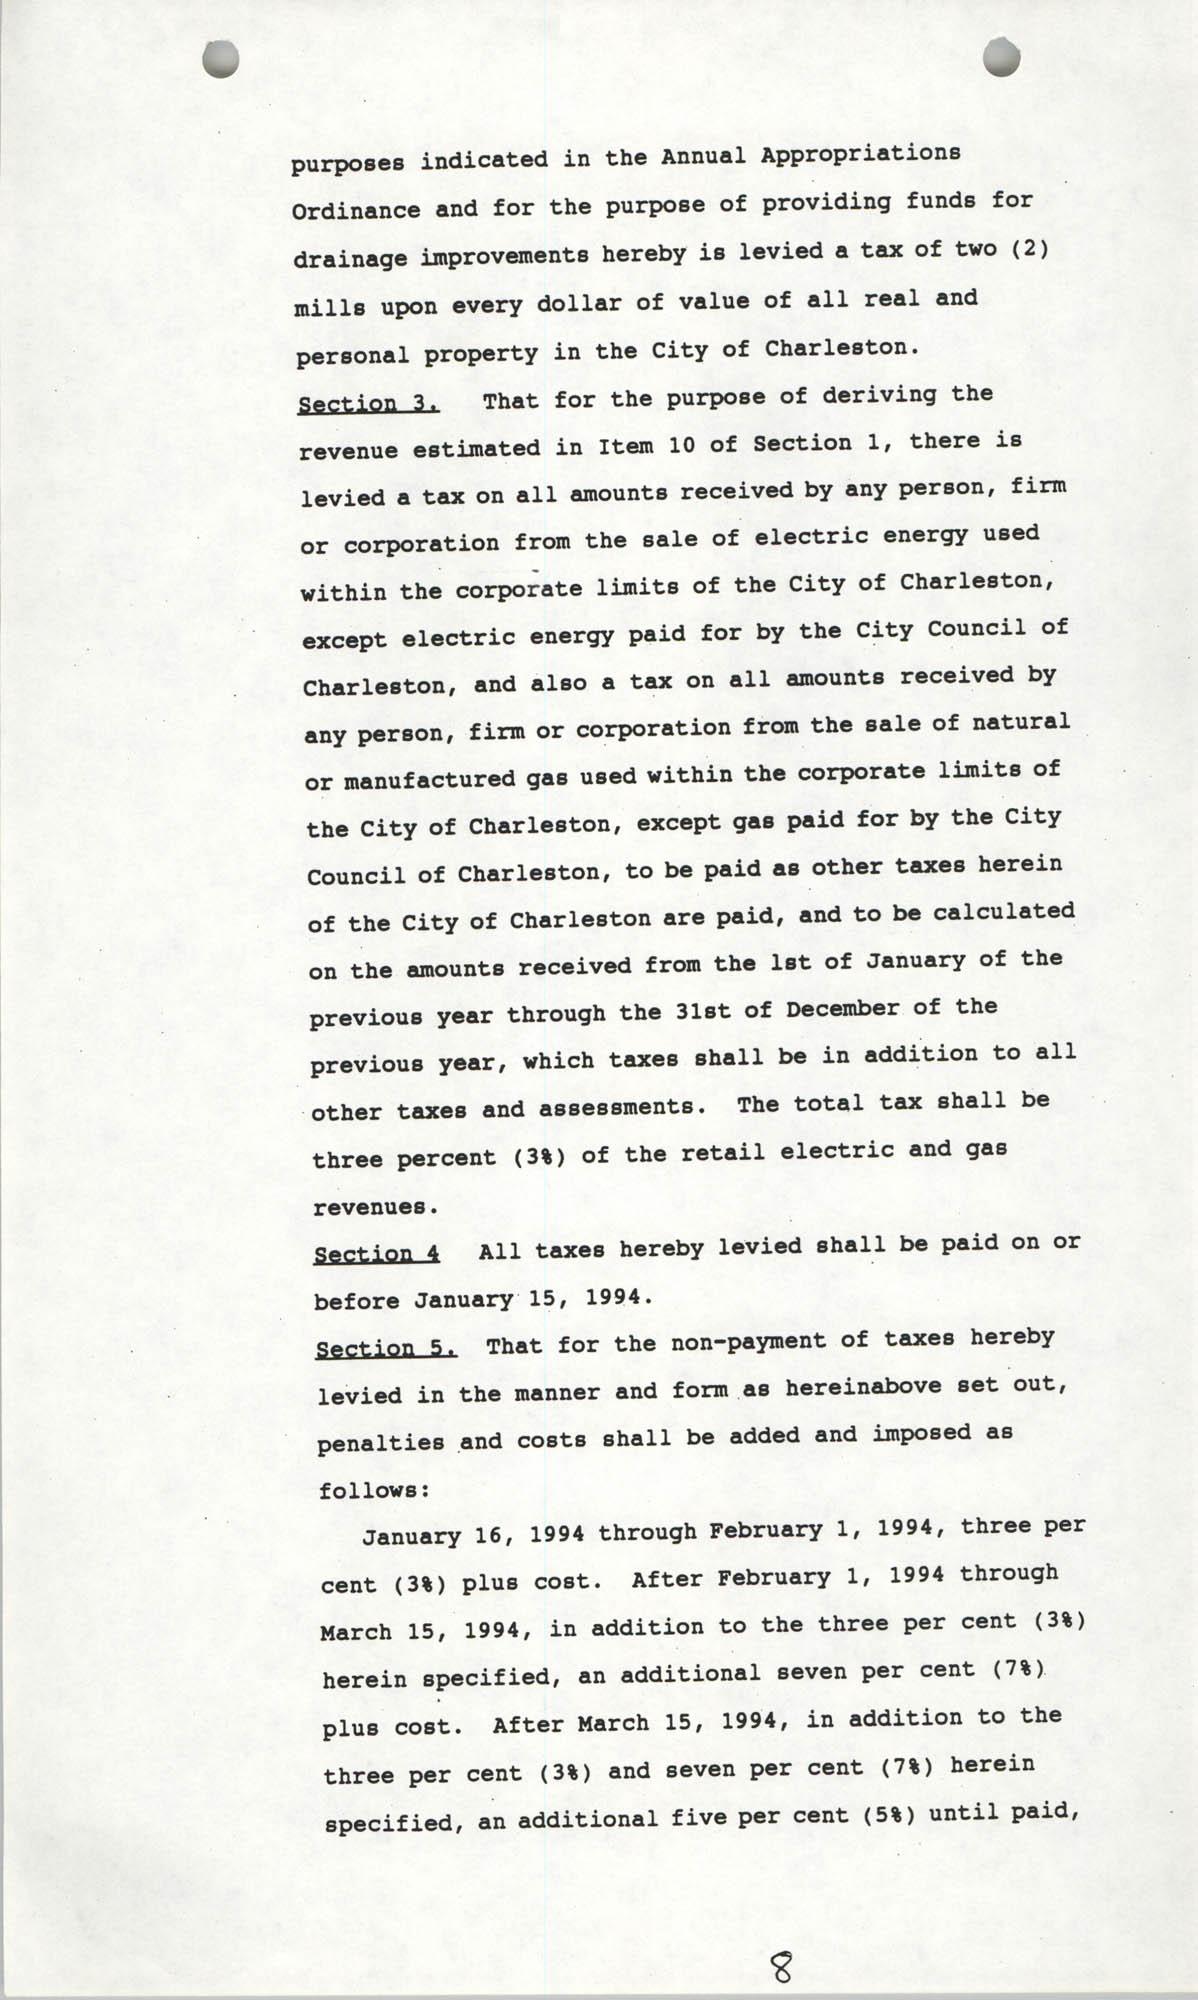 The City Council of Charleston, South Carolina, 1993 Budget, Page 8